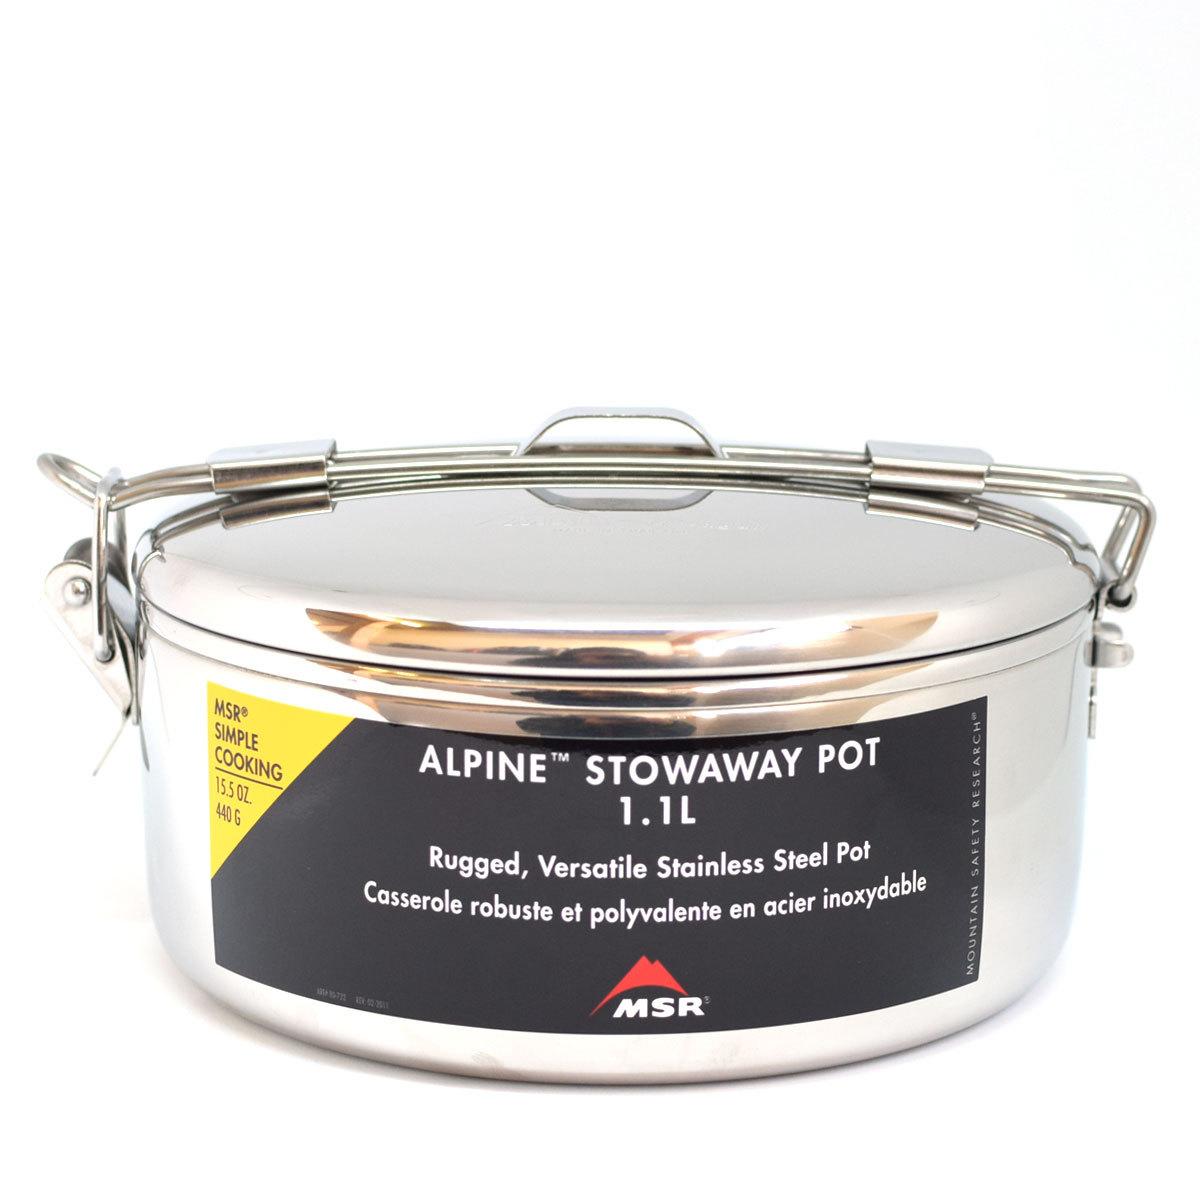 MSR ALPINE STOWAWAY POTS アルパインストアウェイポット 1.1L